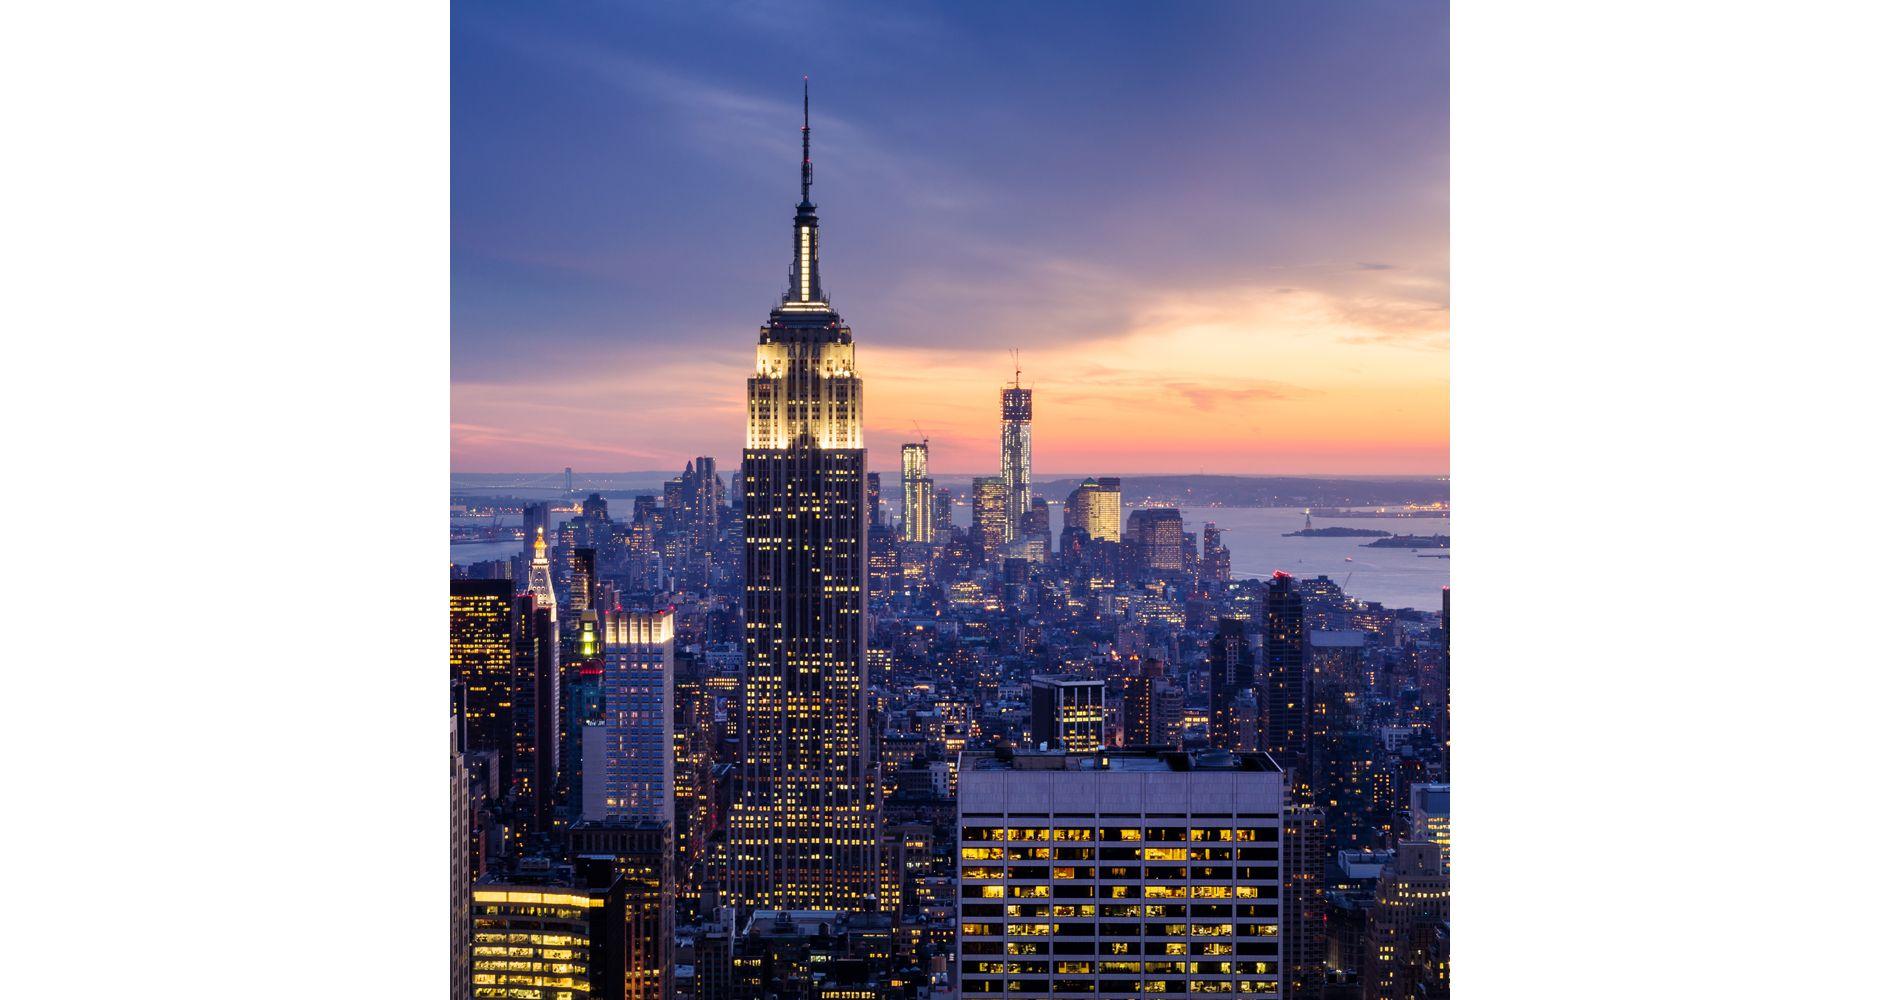 C4924 - Lisbon a New York